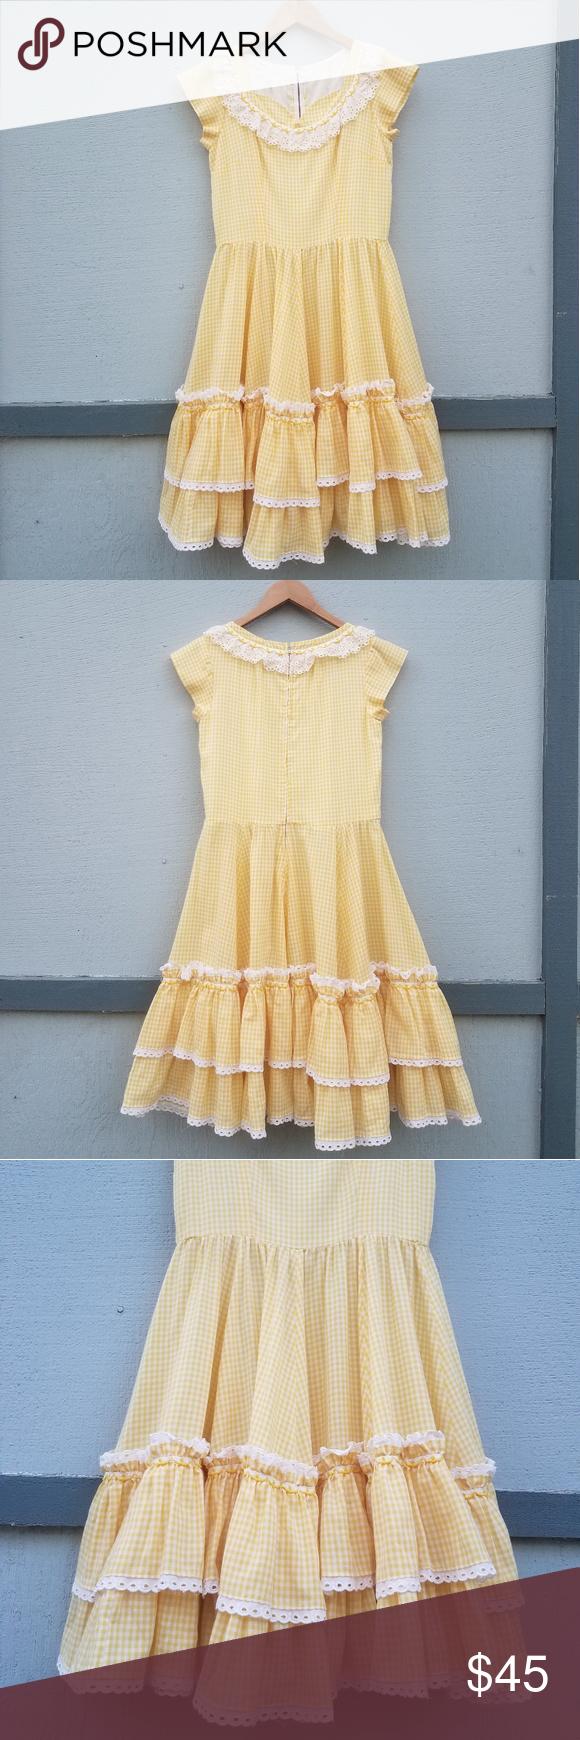 Vintage Handmade Yellow Checkerd Ruffle Dress In 2020 Ruffle Dress Clothes Design Dresses [ 1740 x 580 Pixel ]